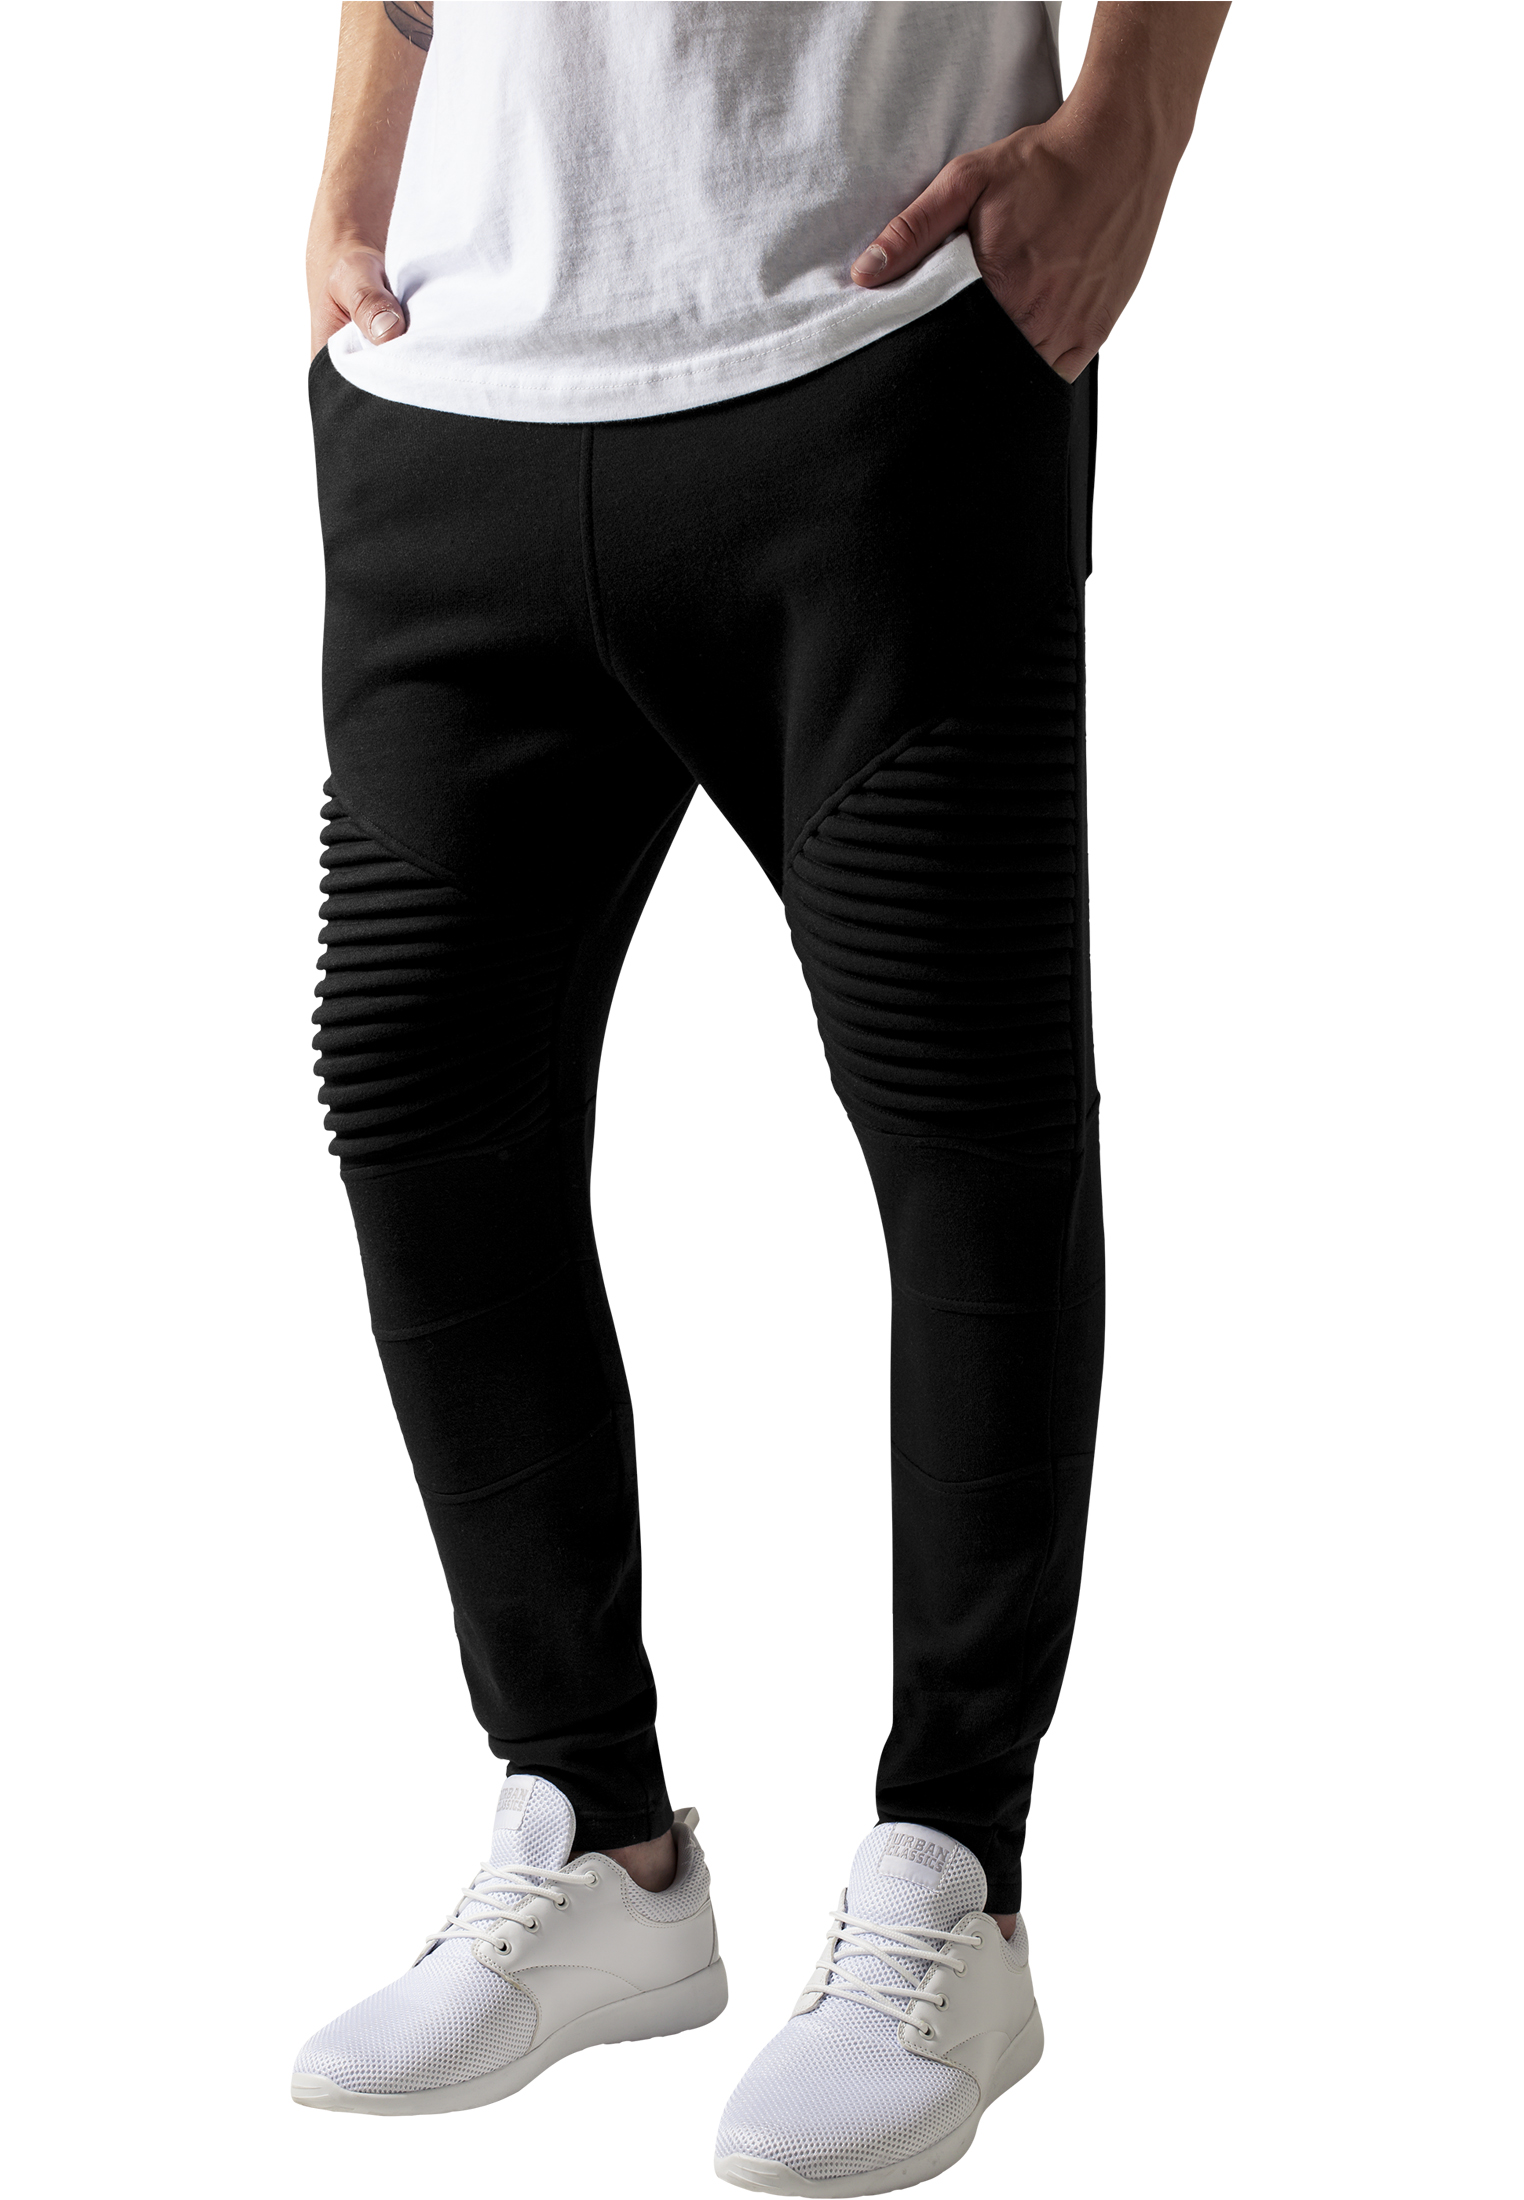 Pleat Sweatpants Tb1415